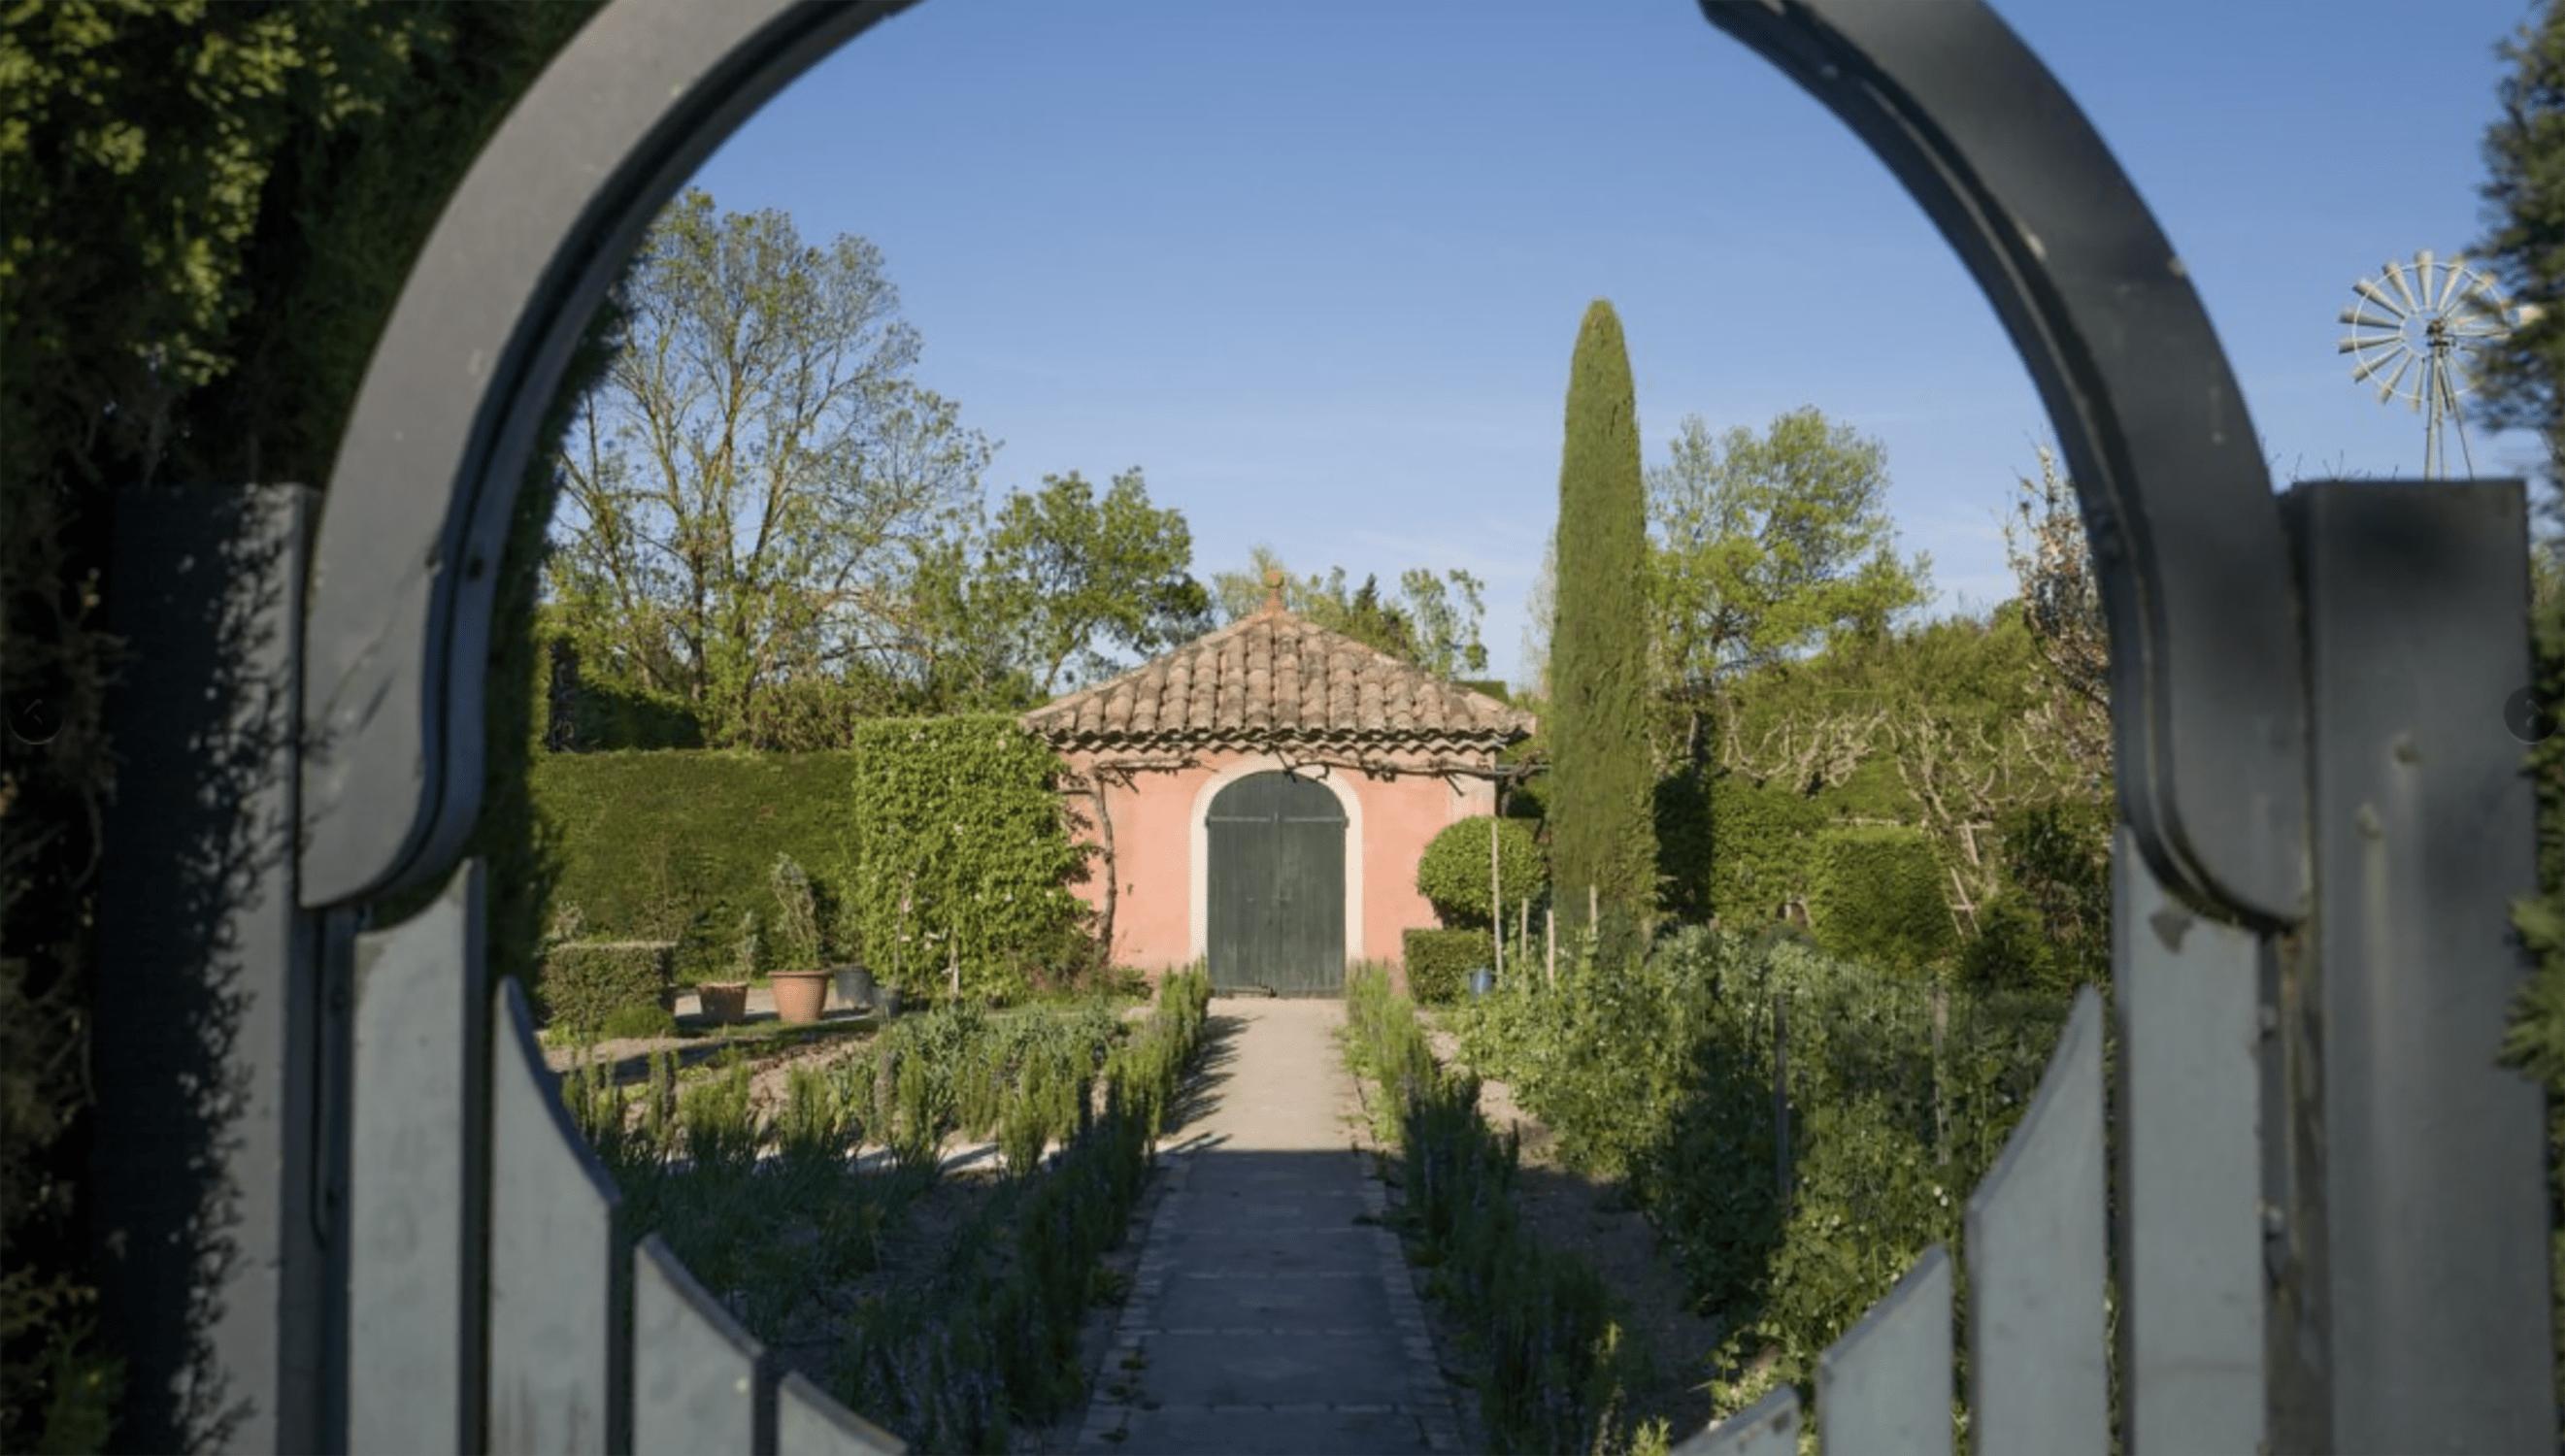 The Kitchen Garden at Les Confines